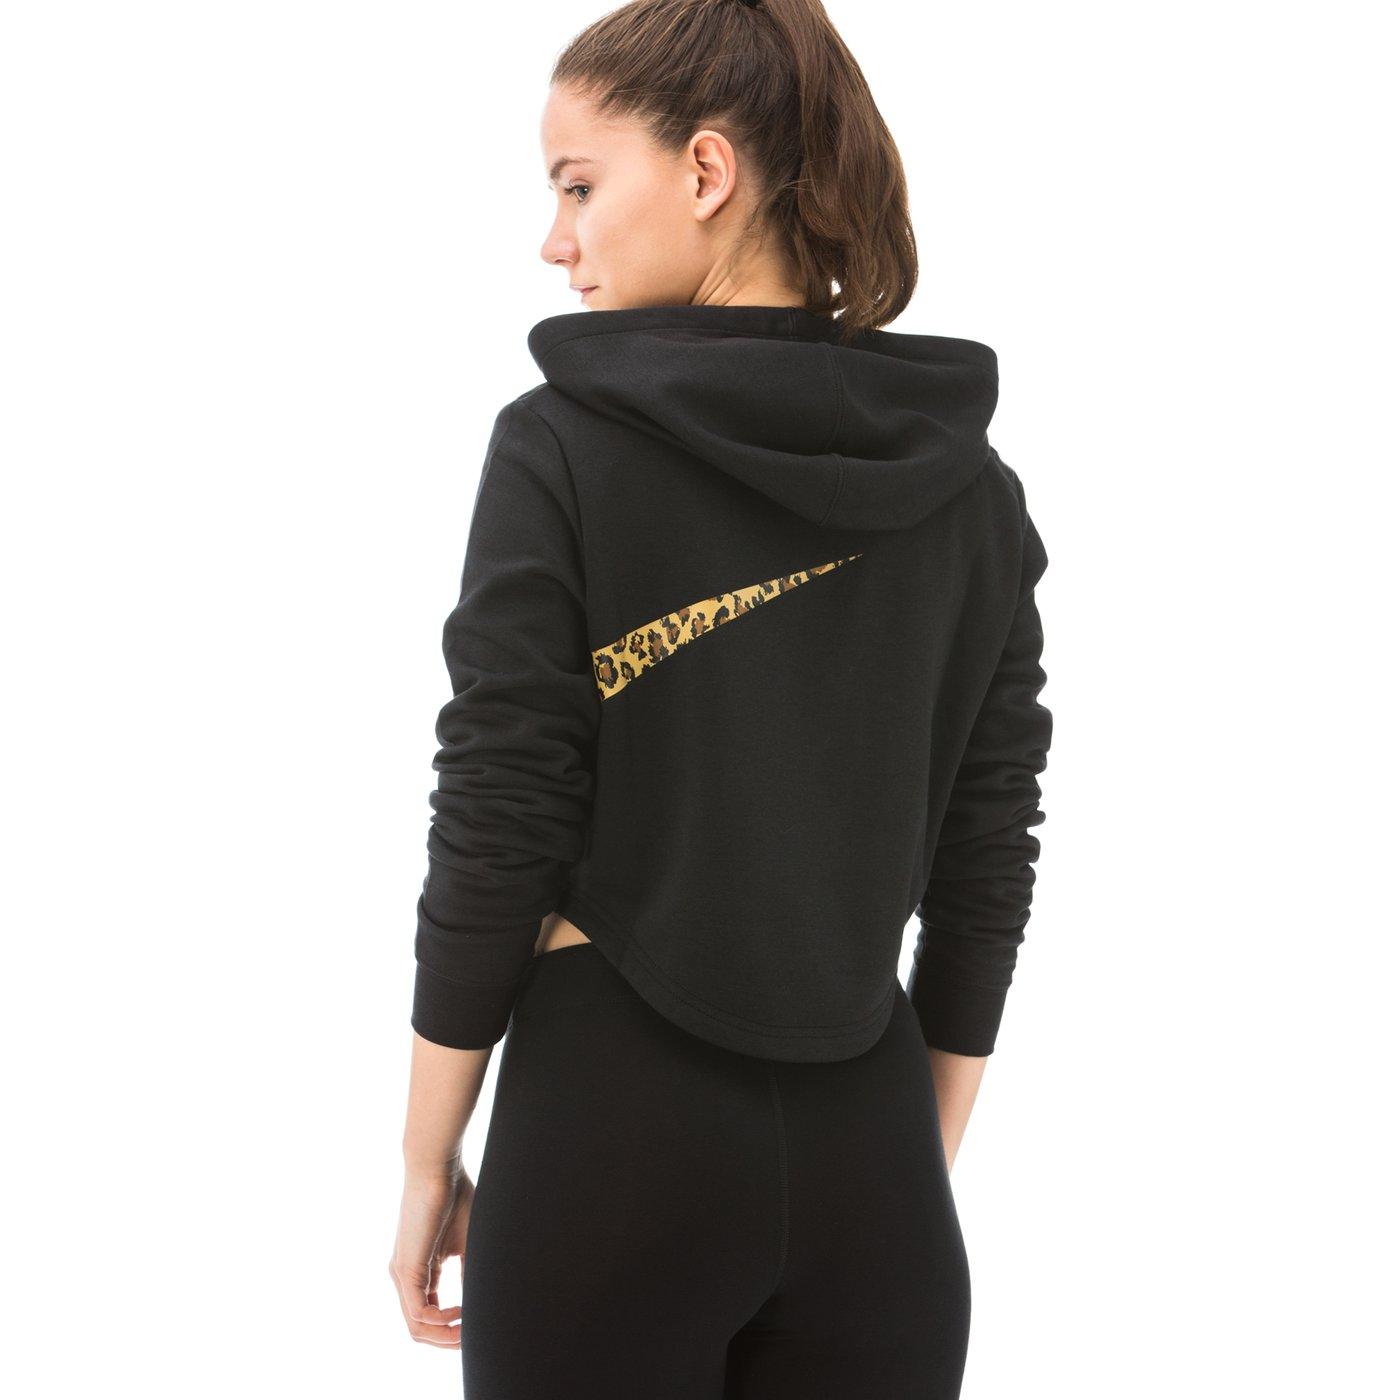 Nike Sportswear Croped Hoodie Kadın Siyah Sweatshirt